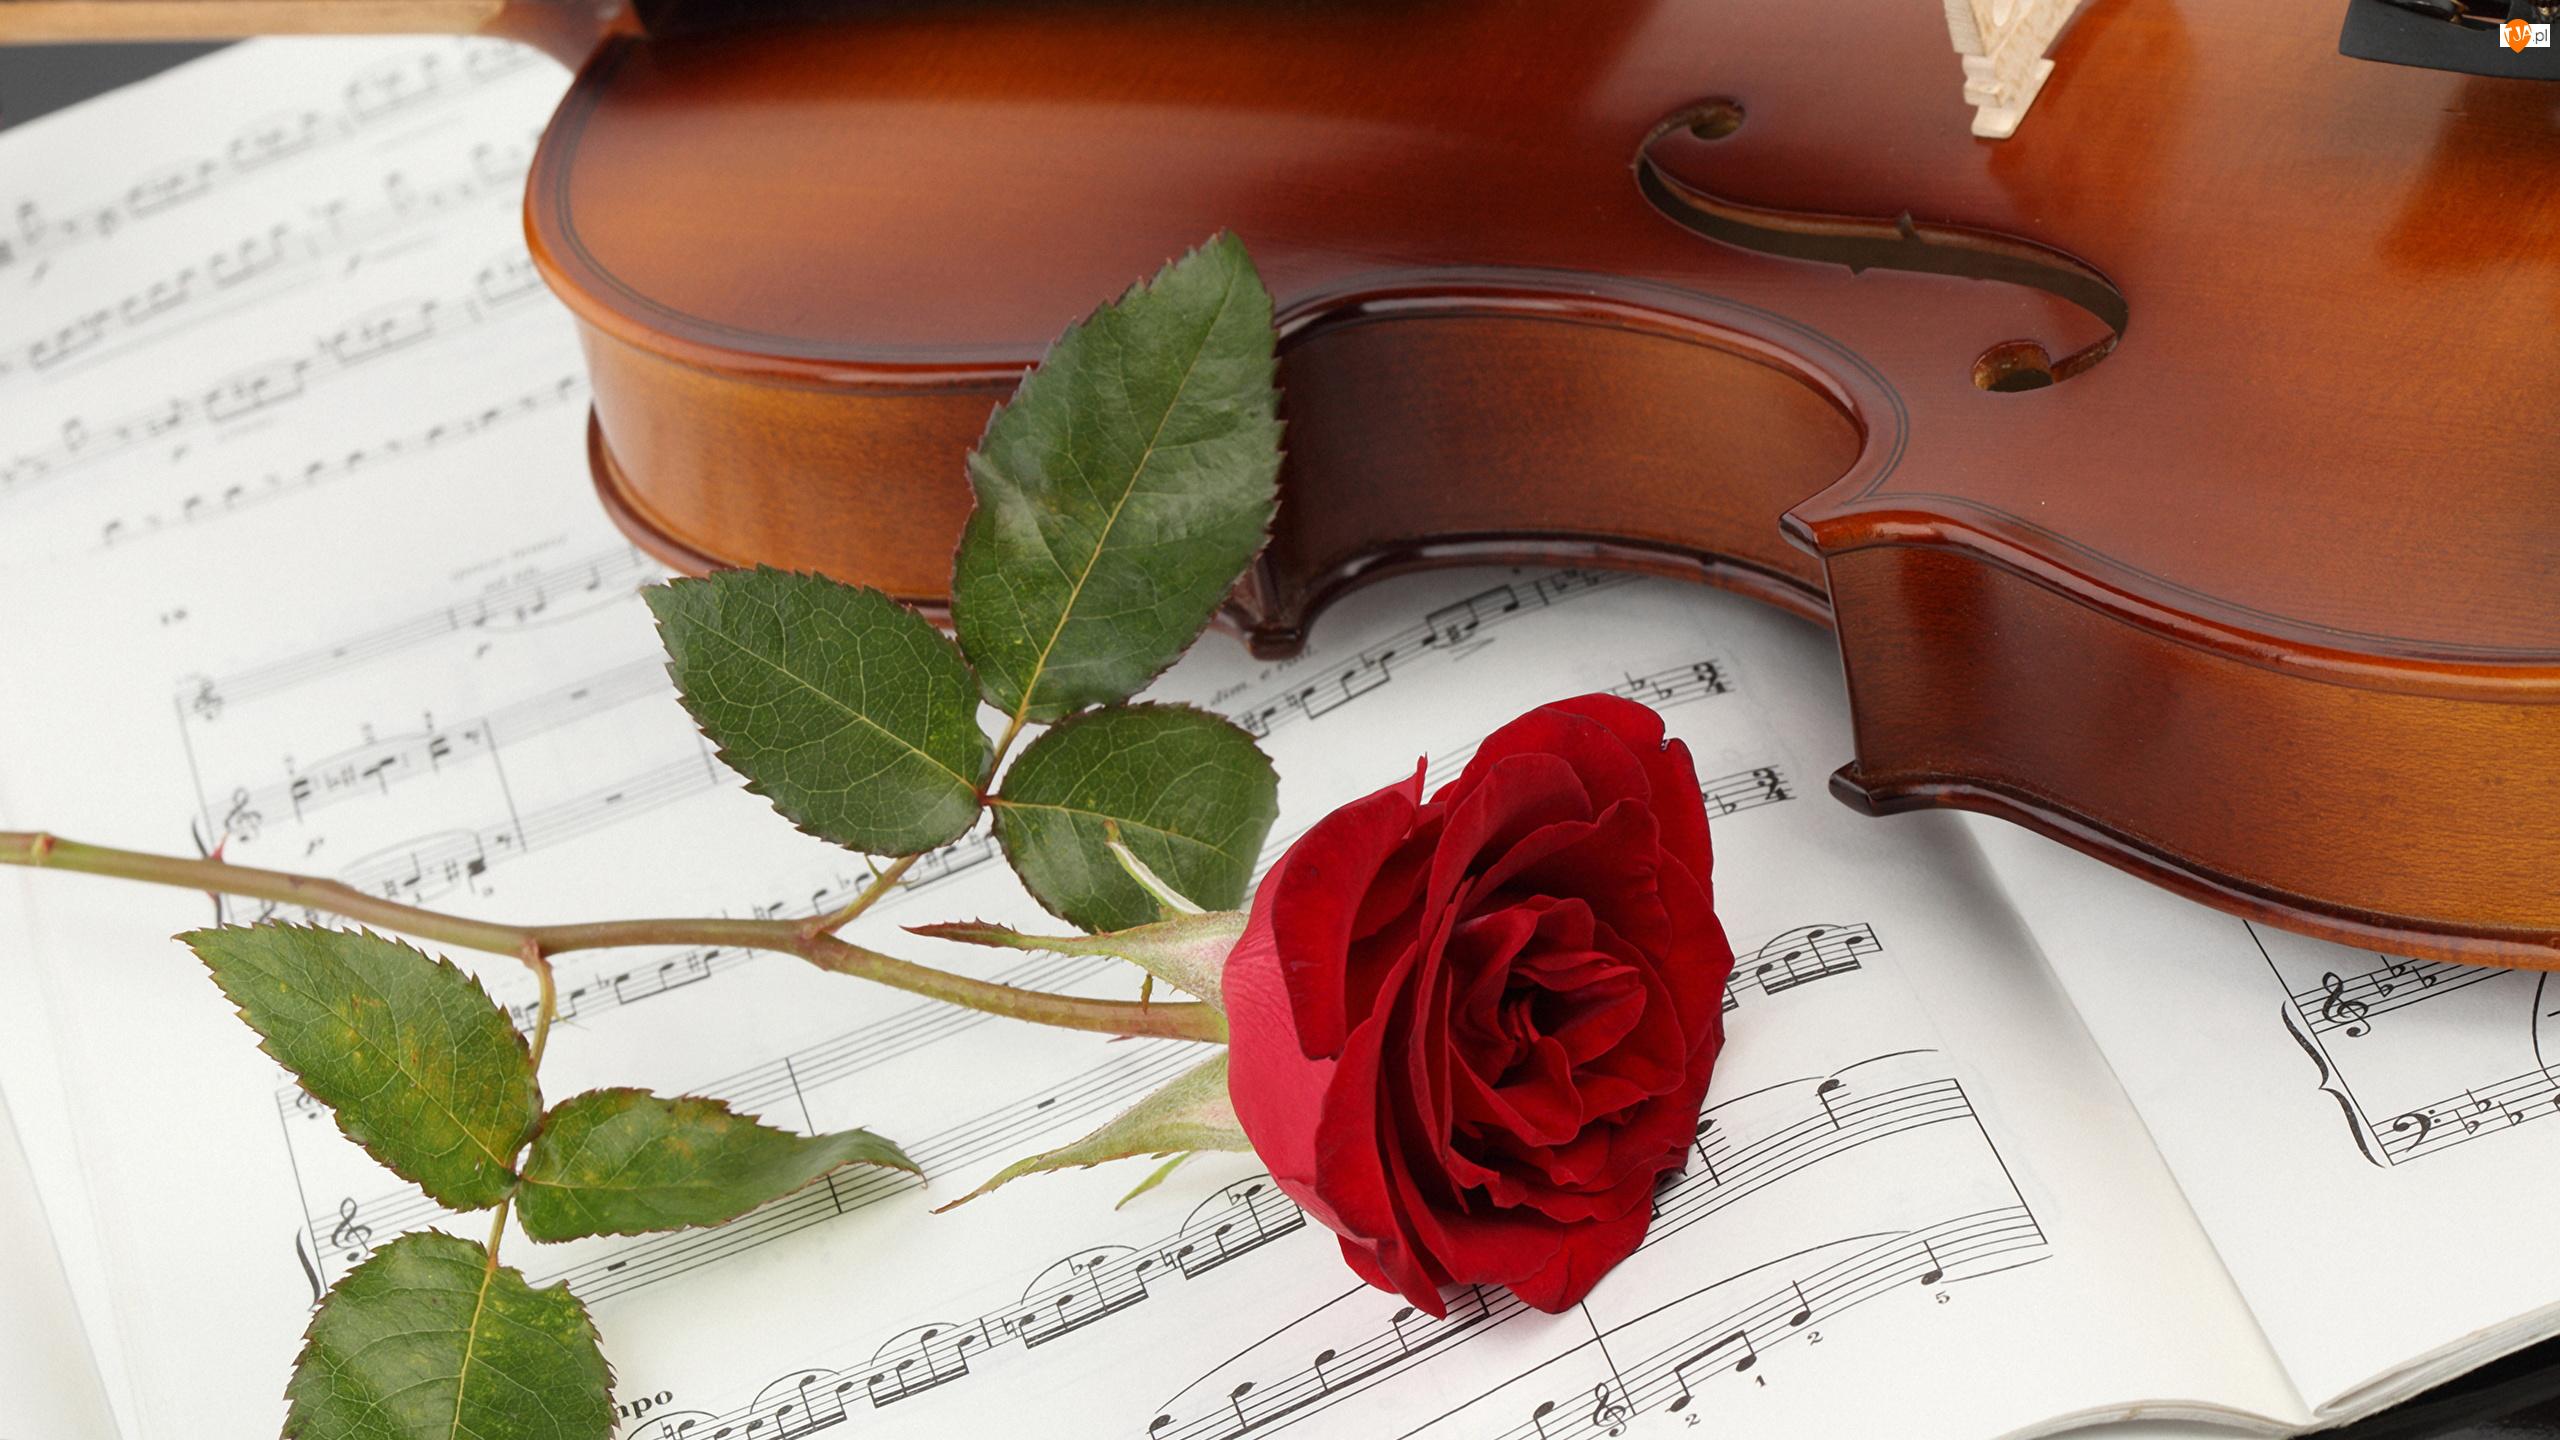 Róża, Skrzypce, Nuty, Kwiat